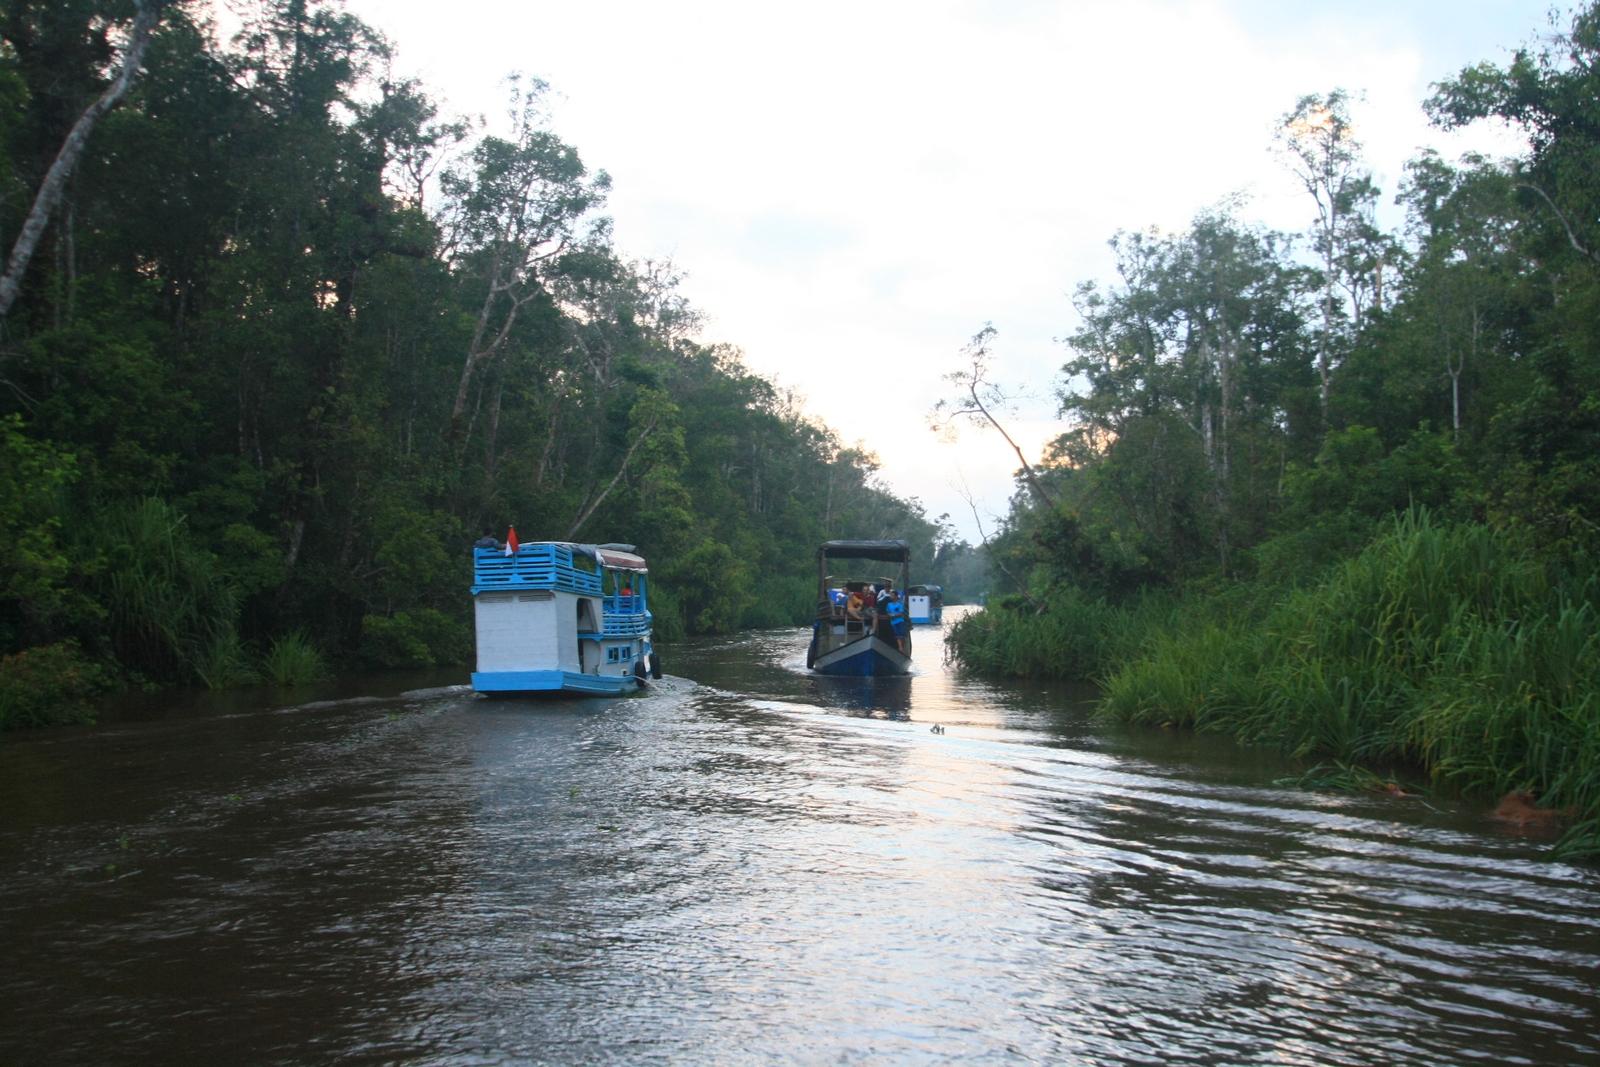 Cruising Black water river by klotok